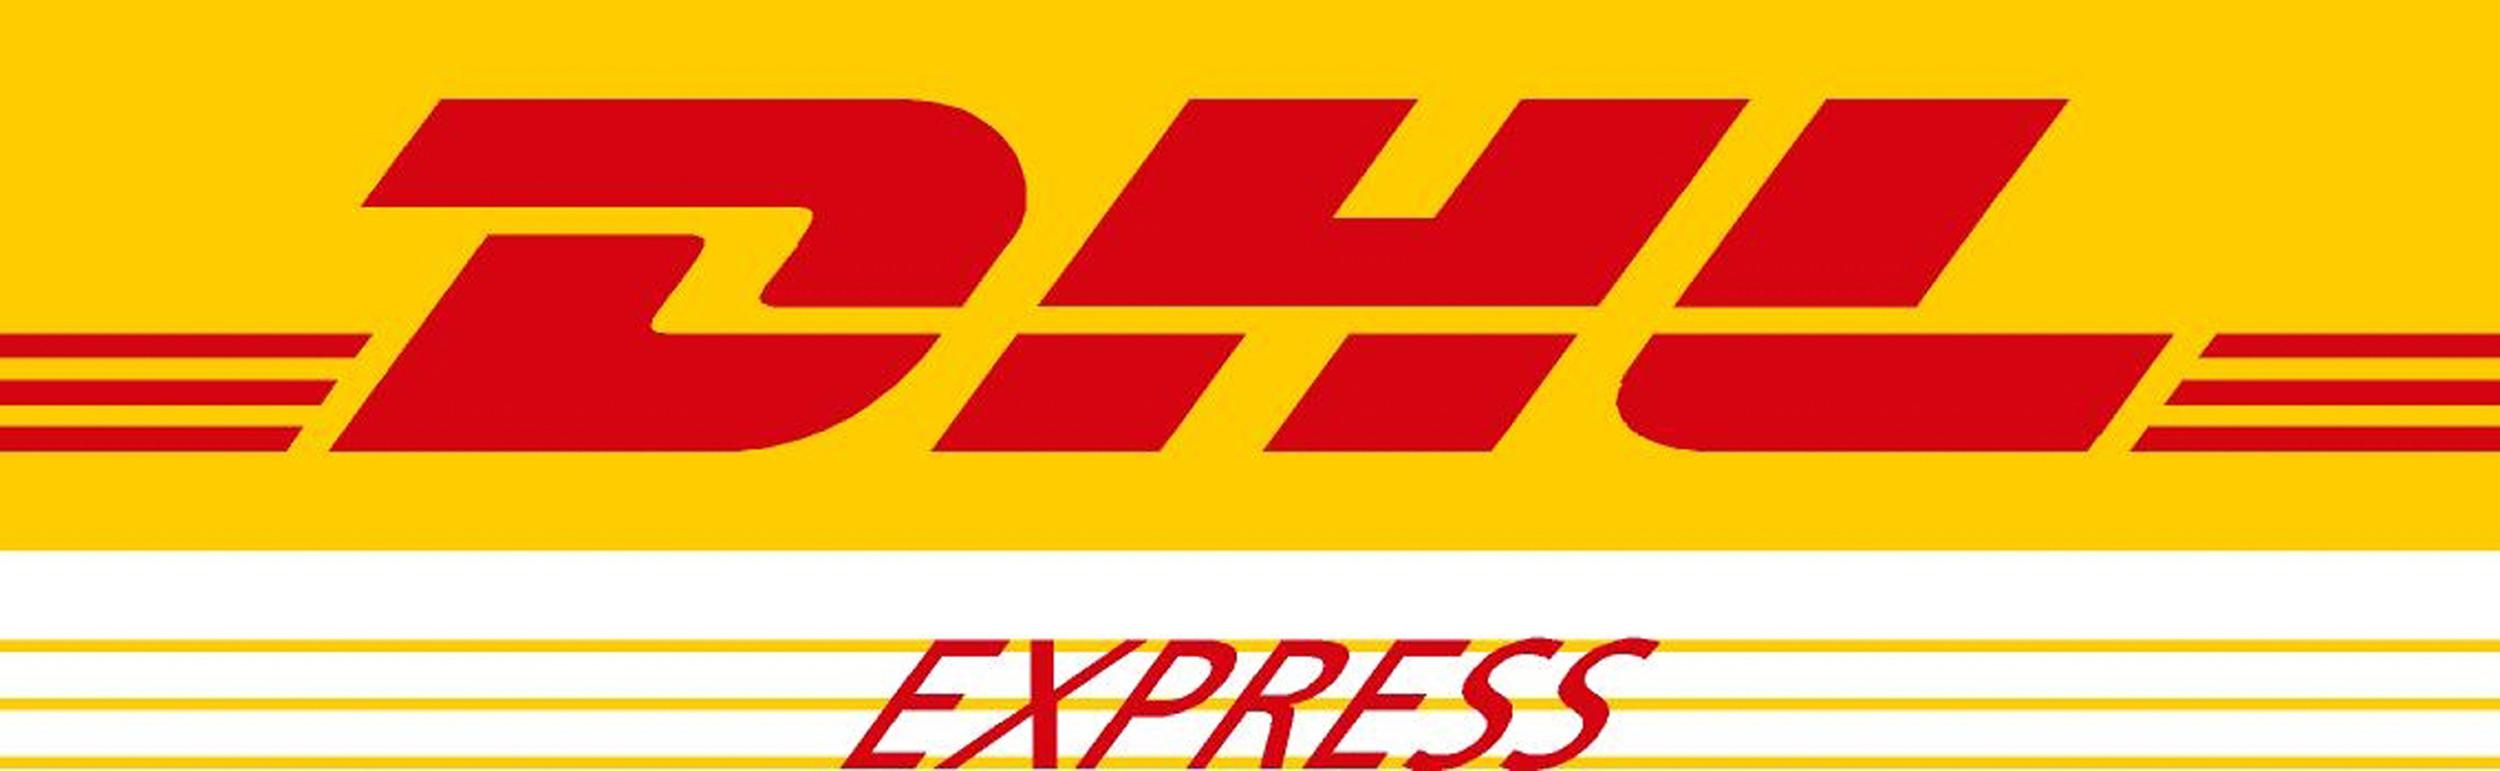 DHL_Express.jpg